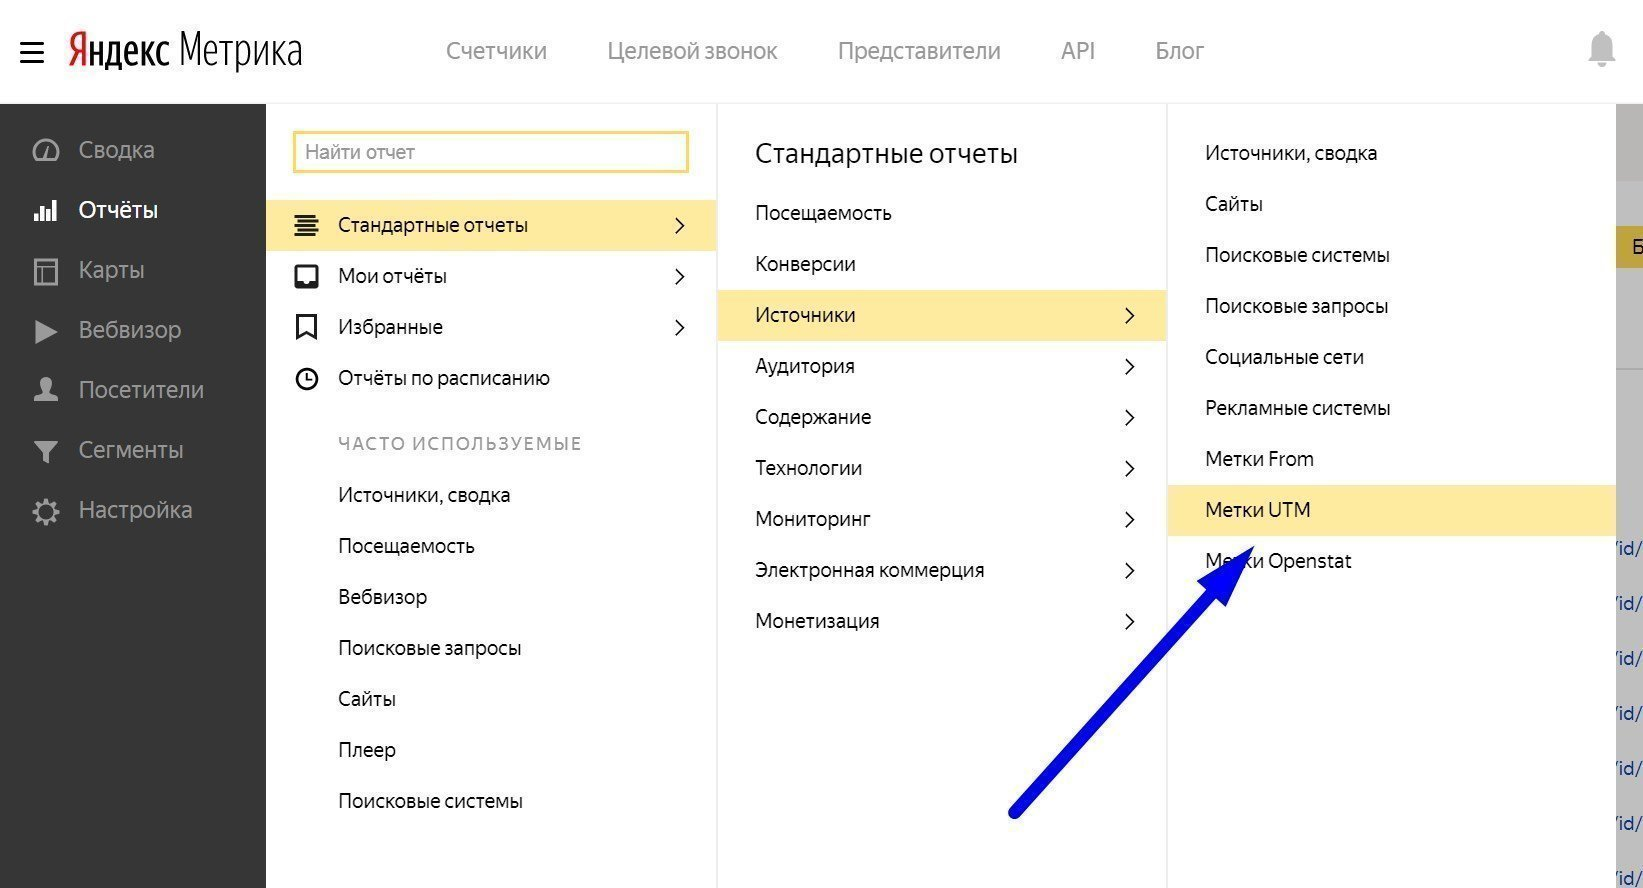 UTM-метки в Яндекс.Директ и Метрике: примеры и настройки